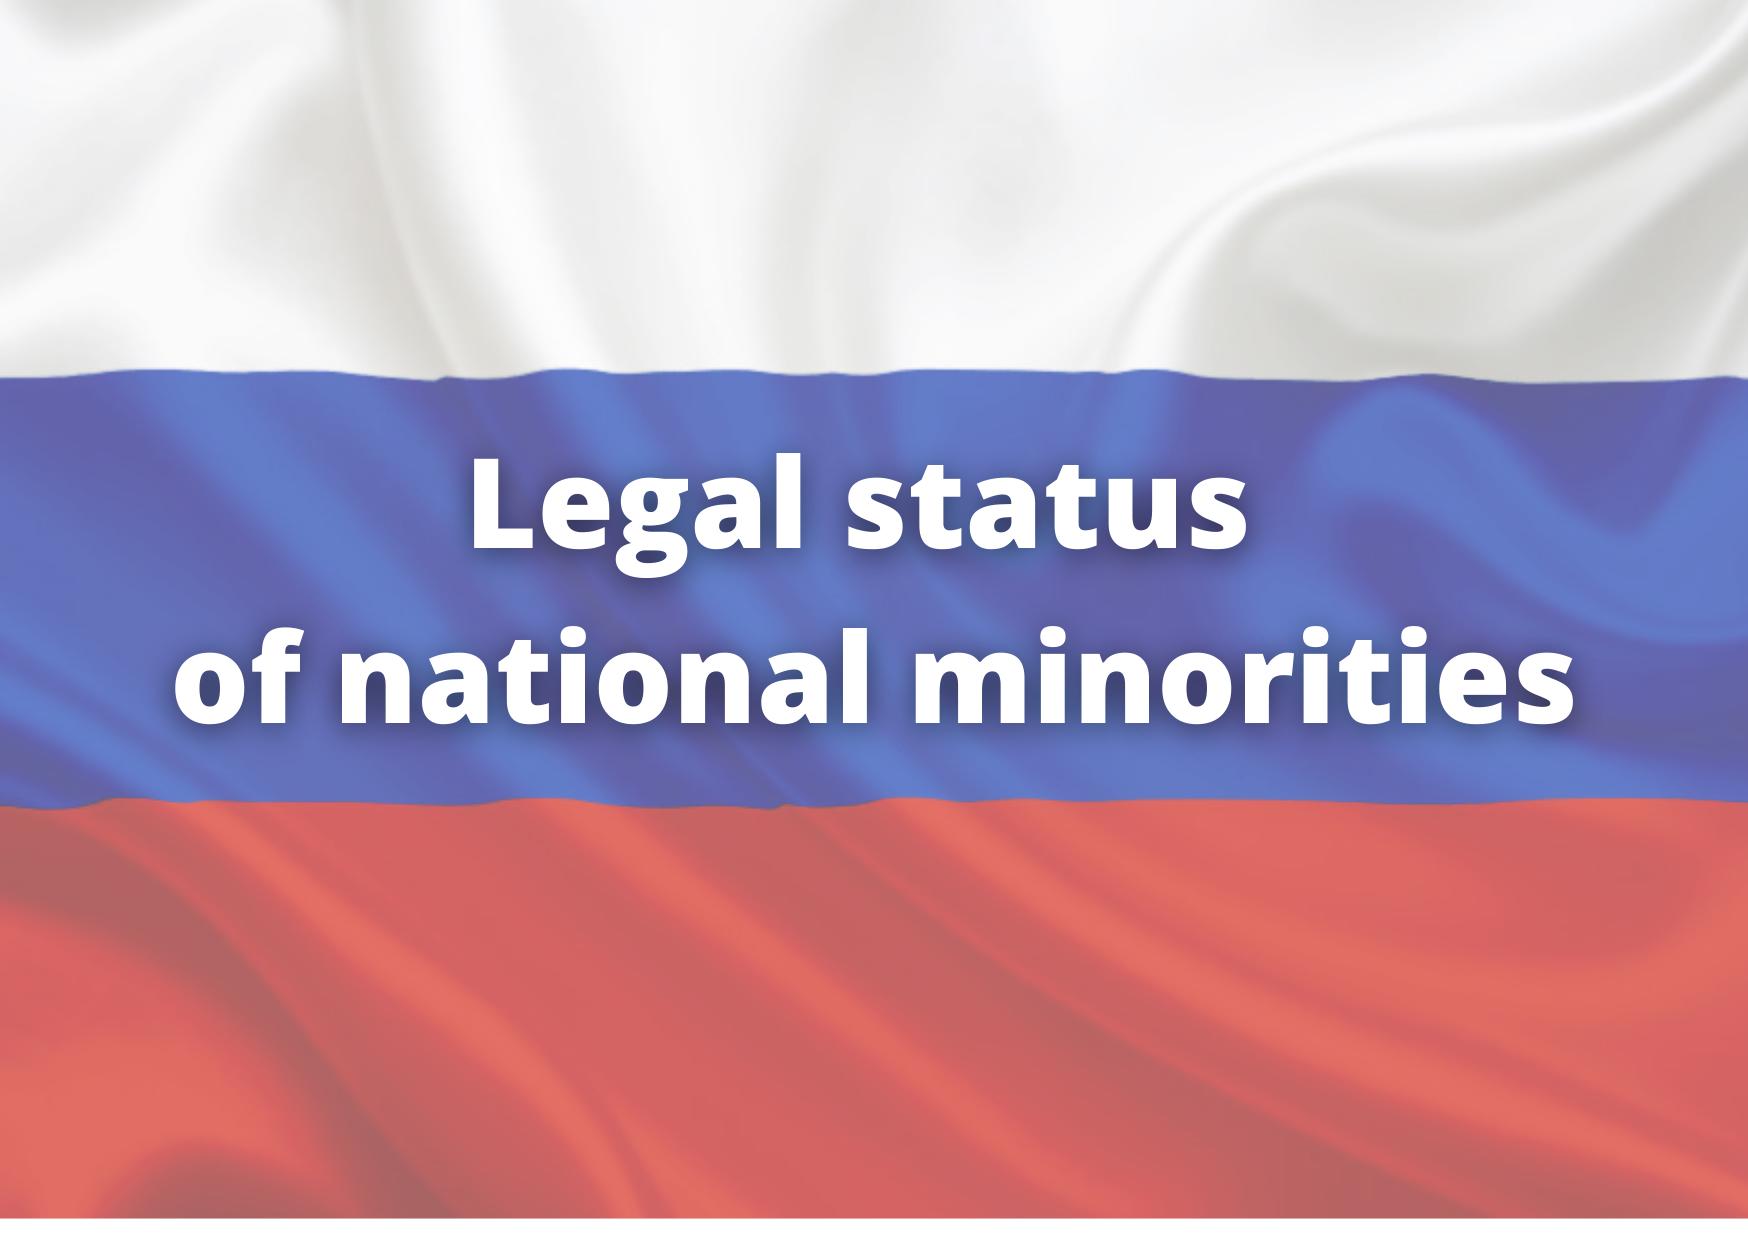 Legal status of national minorities LEGAL STATUS OF NATIONAL MINORITIES IN RUSSIA